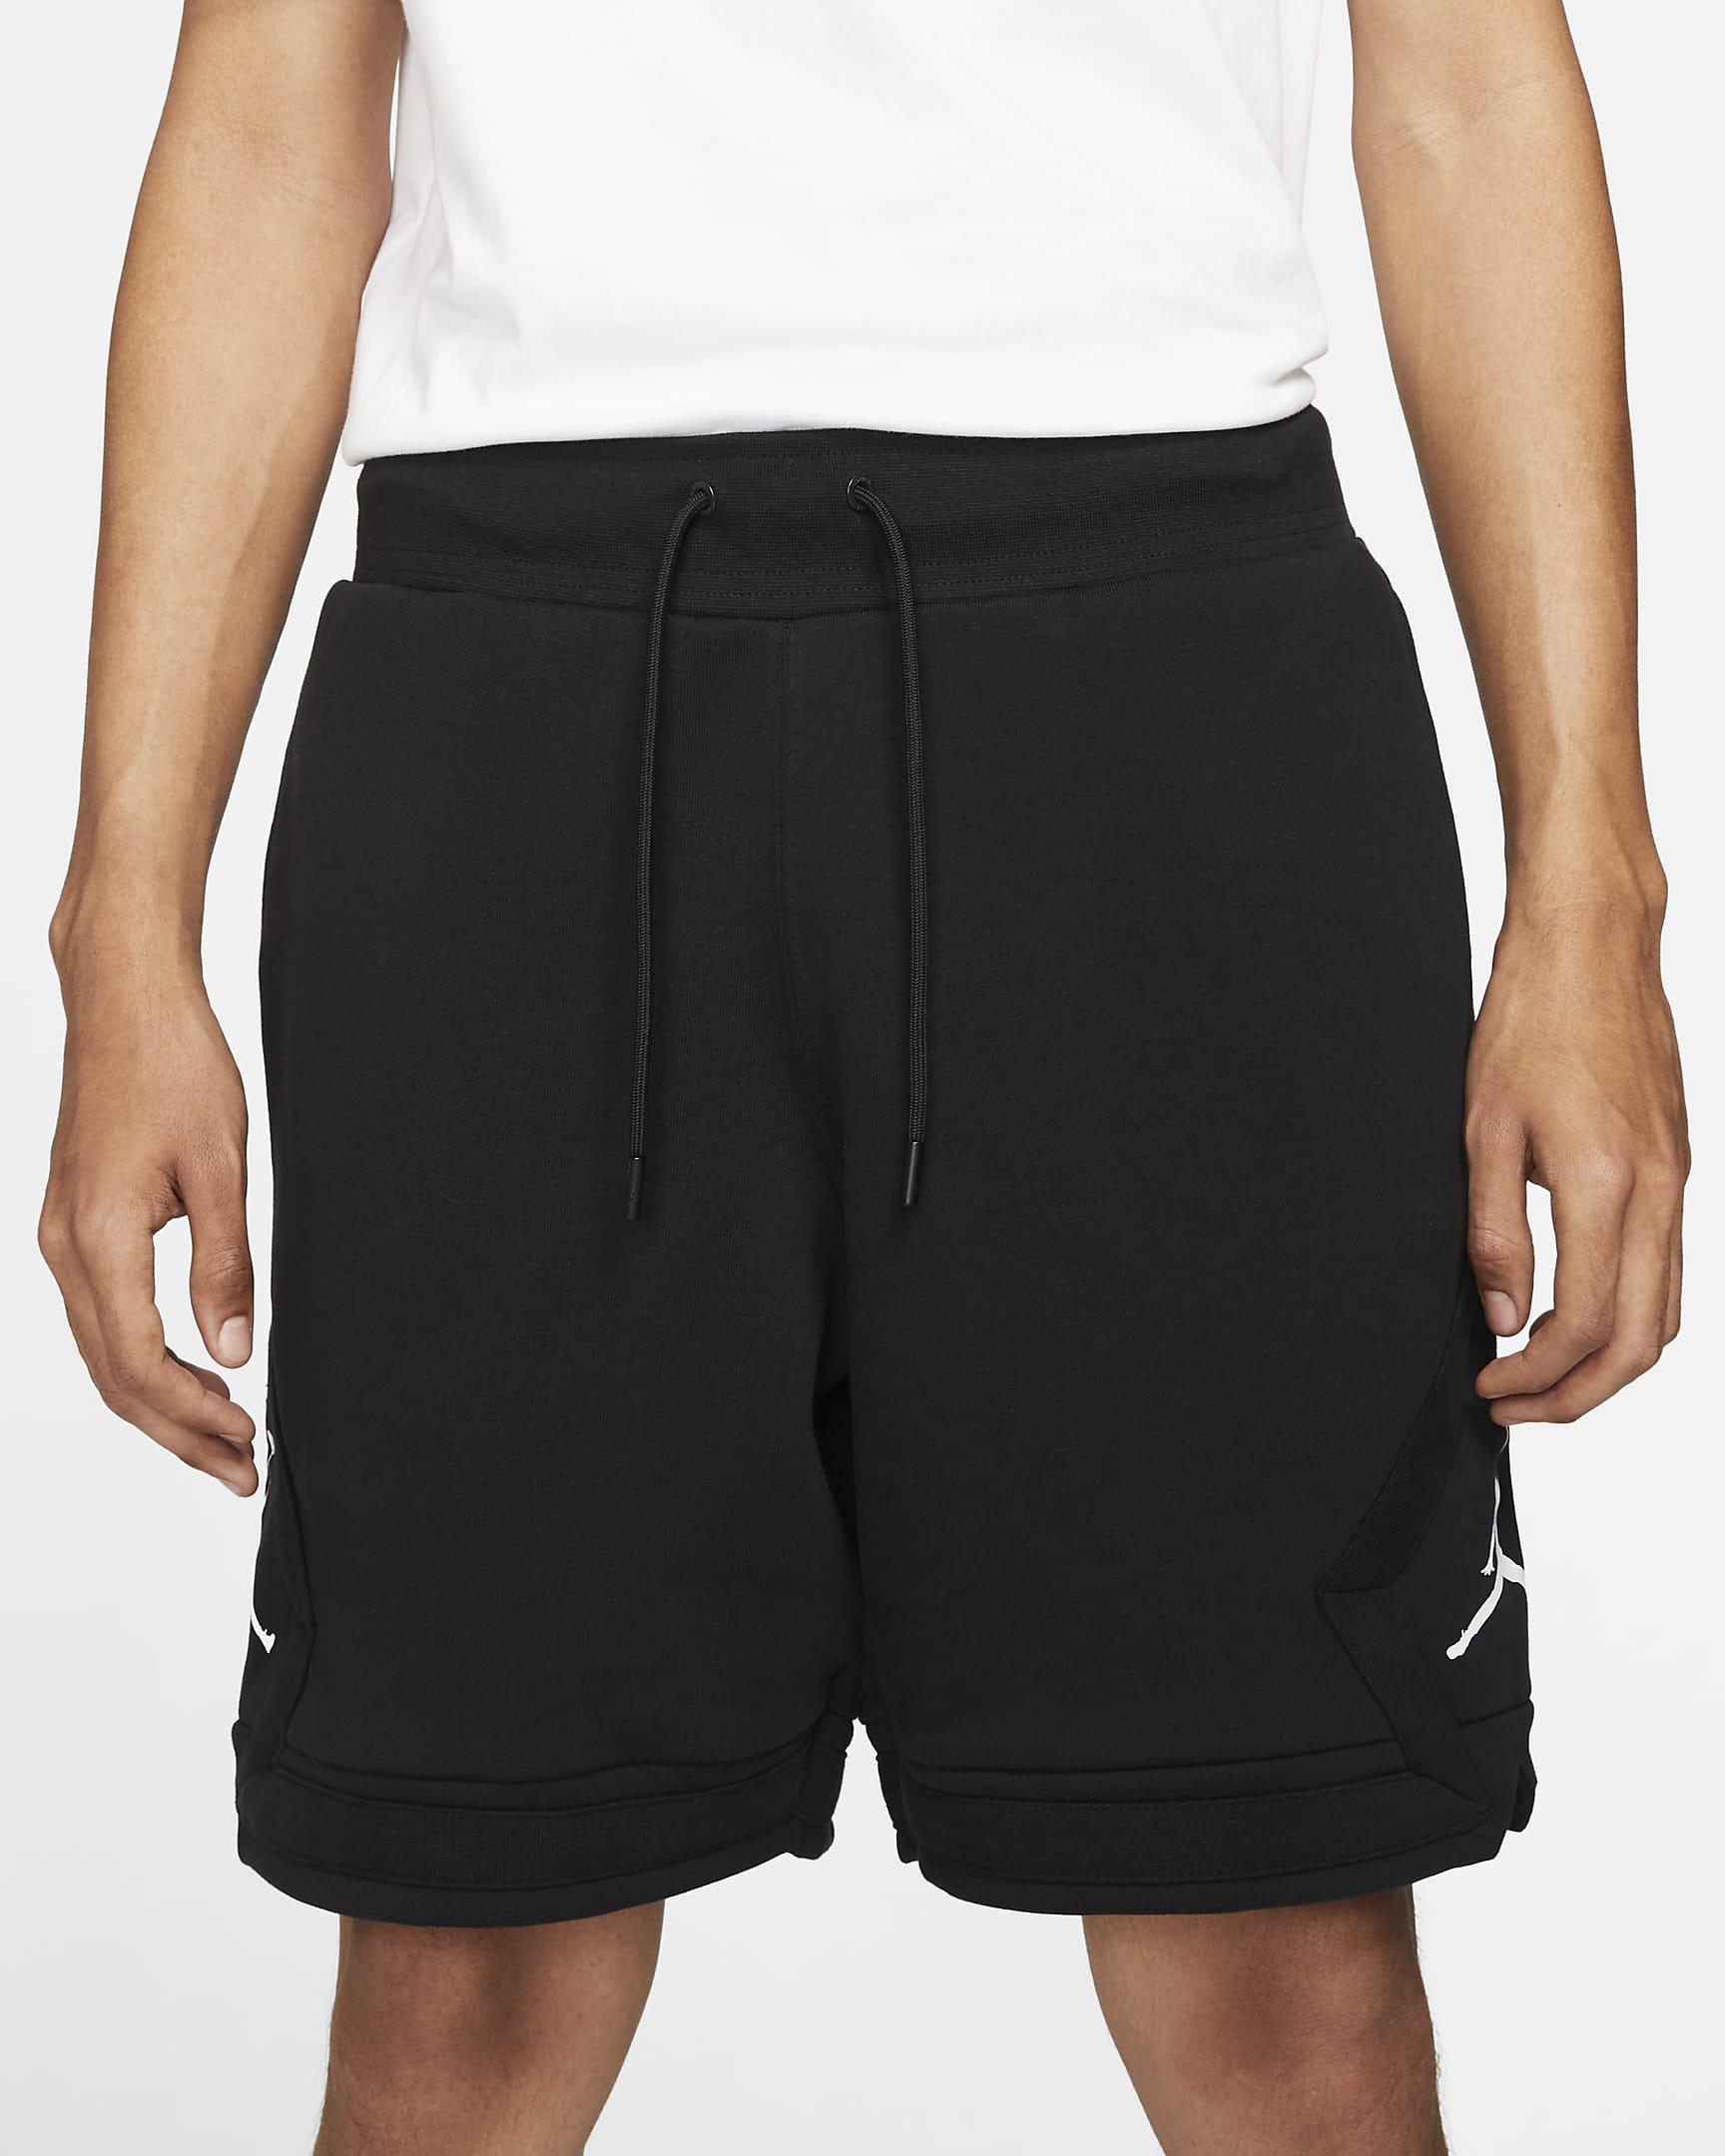 jordan-essential-mens-fleece-diamond-shorts-hcJWW8.png